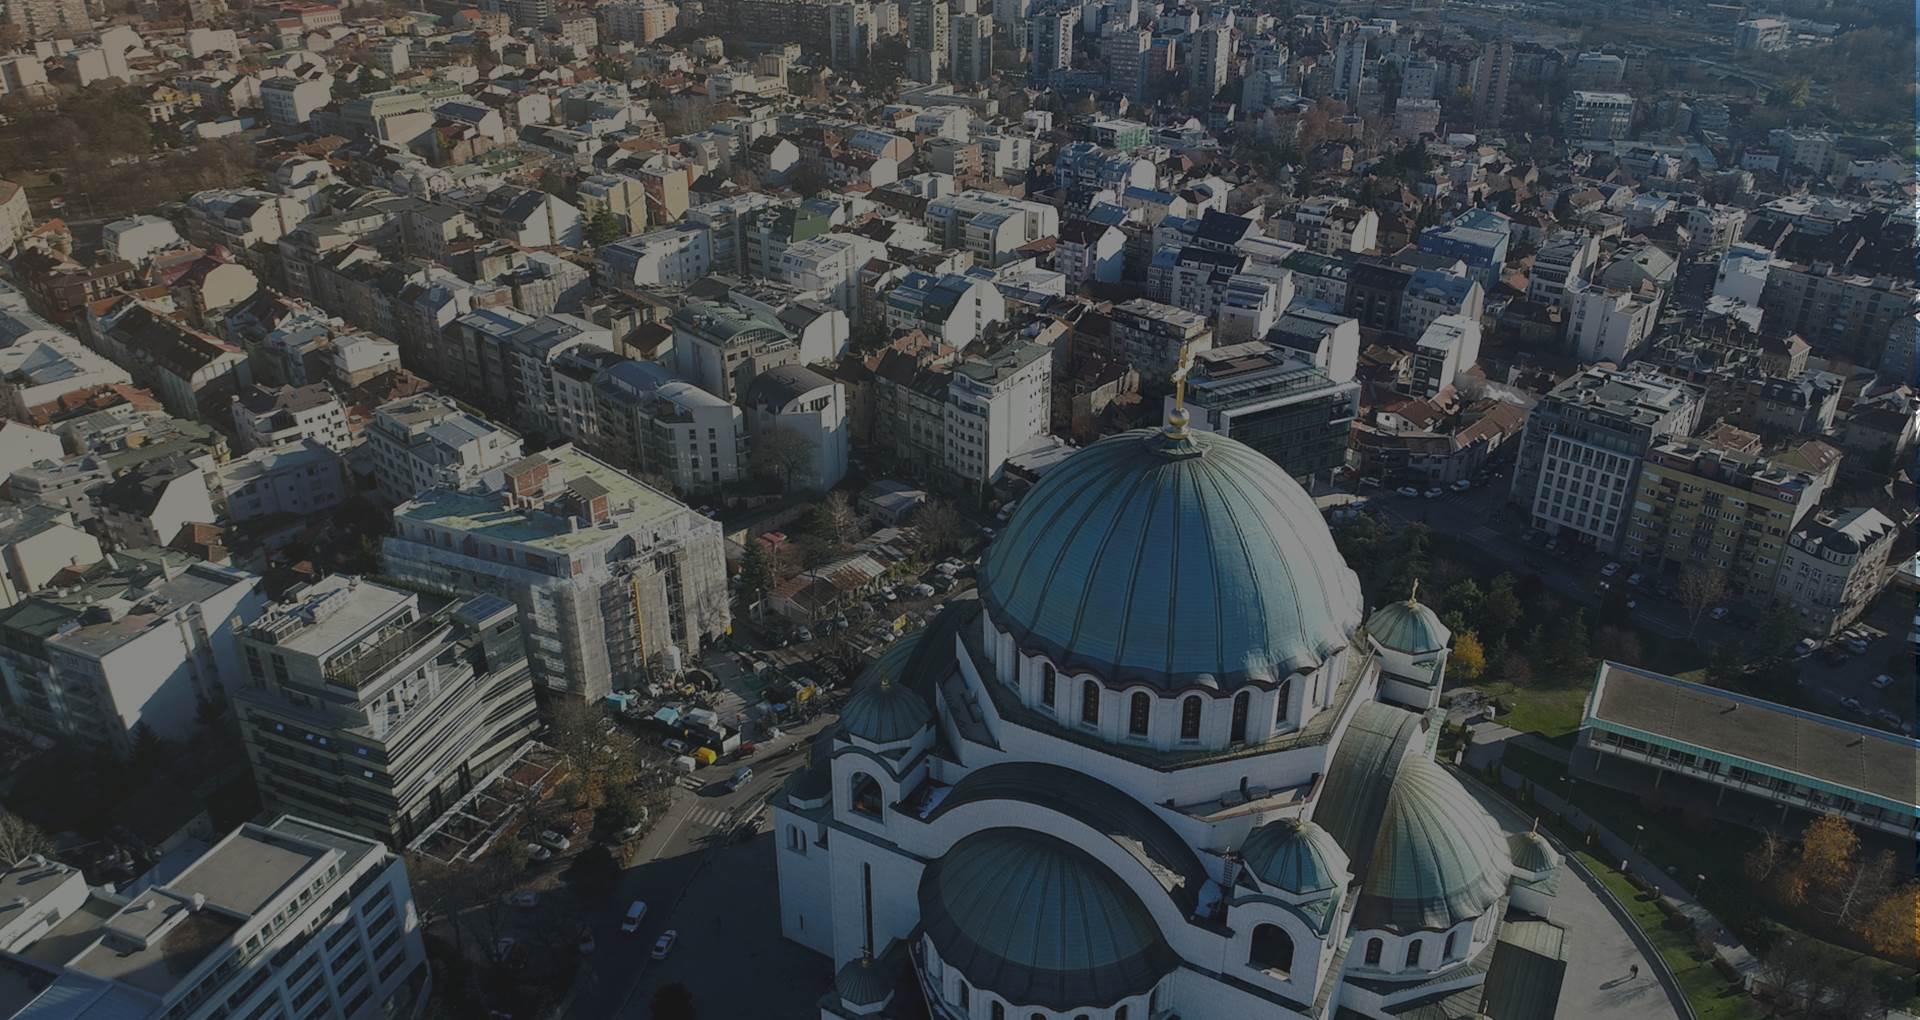 Beograd zivi 1920x1020@2x.jpg